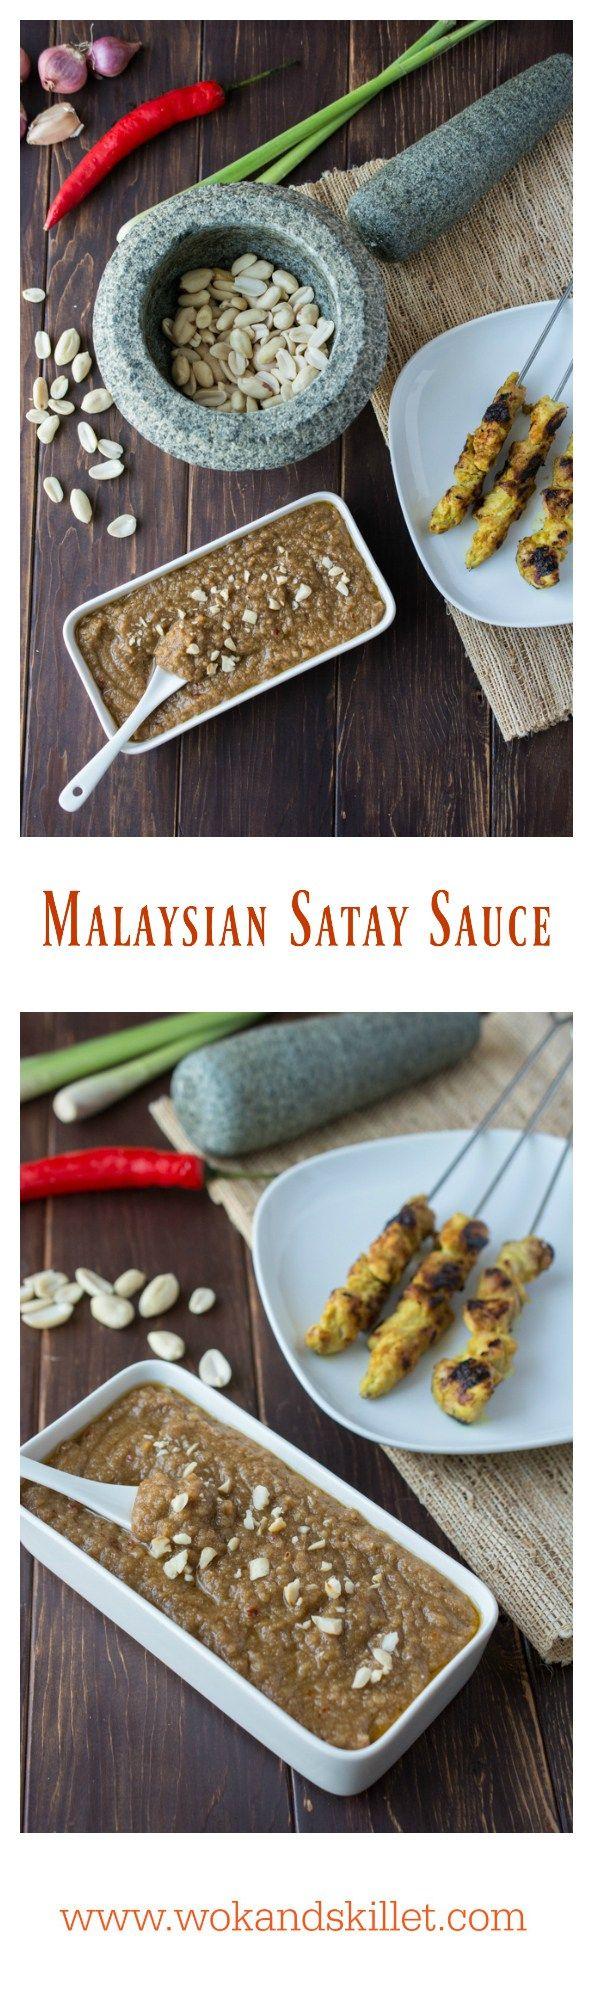 Malaysian Satay Sauce